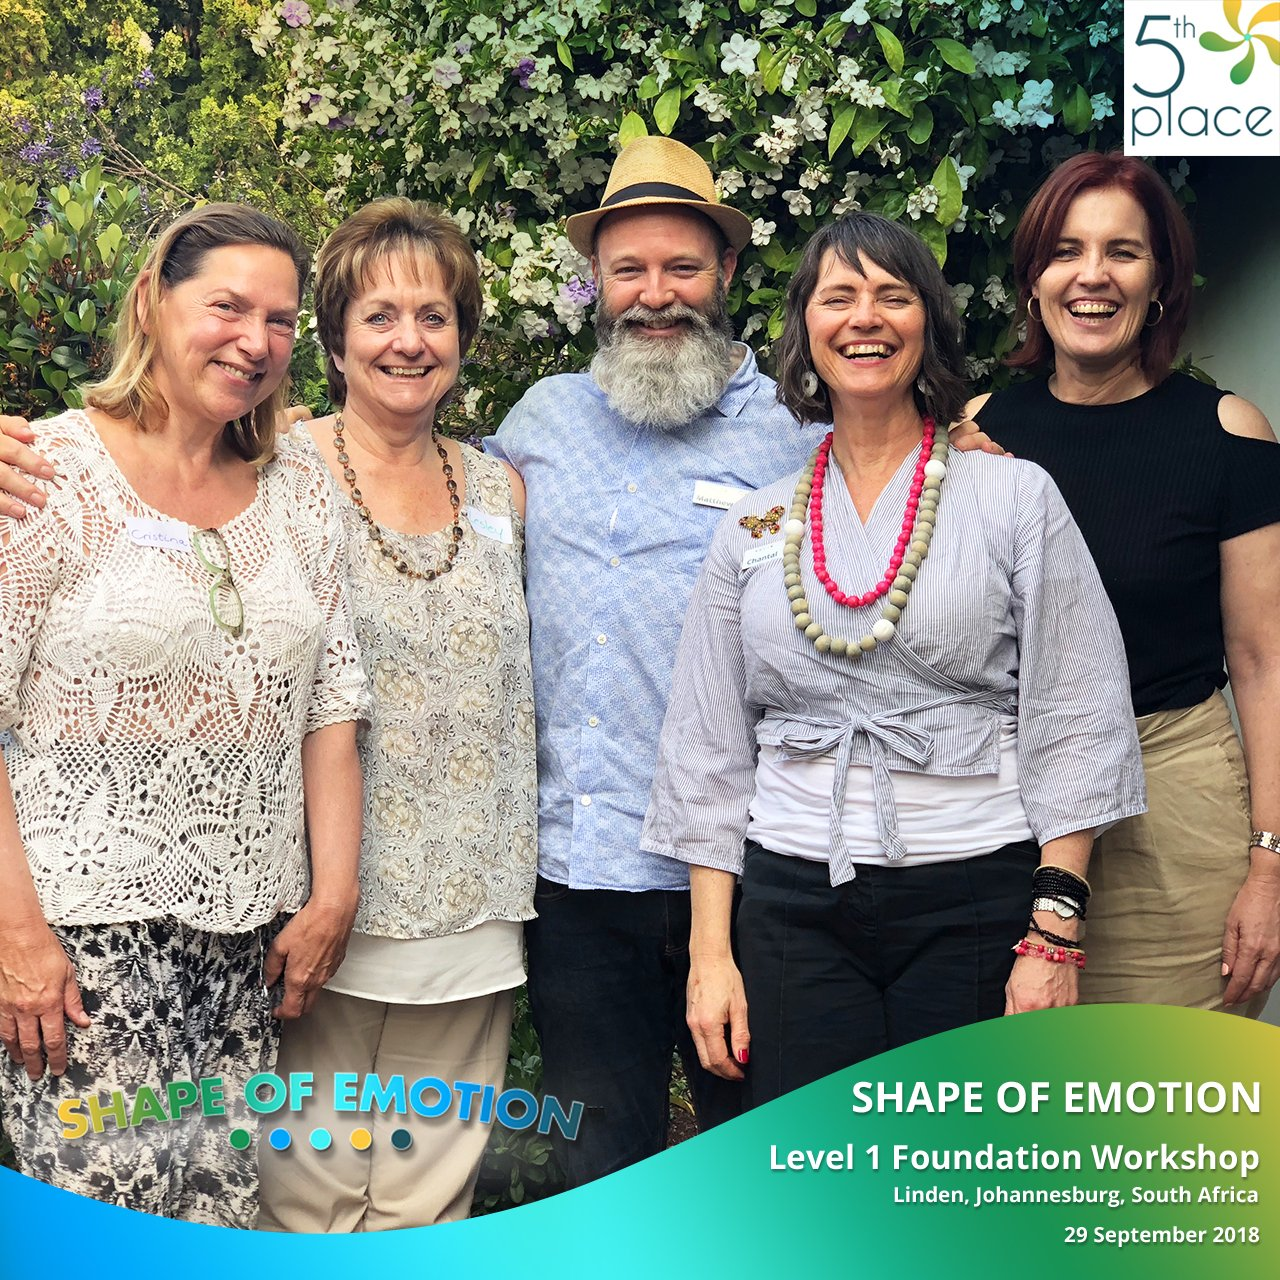 Shape of Emotion Level 1 Foundation. 29 September, 2018